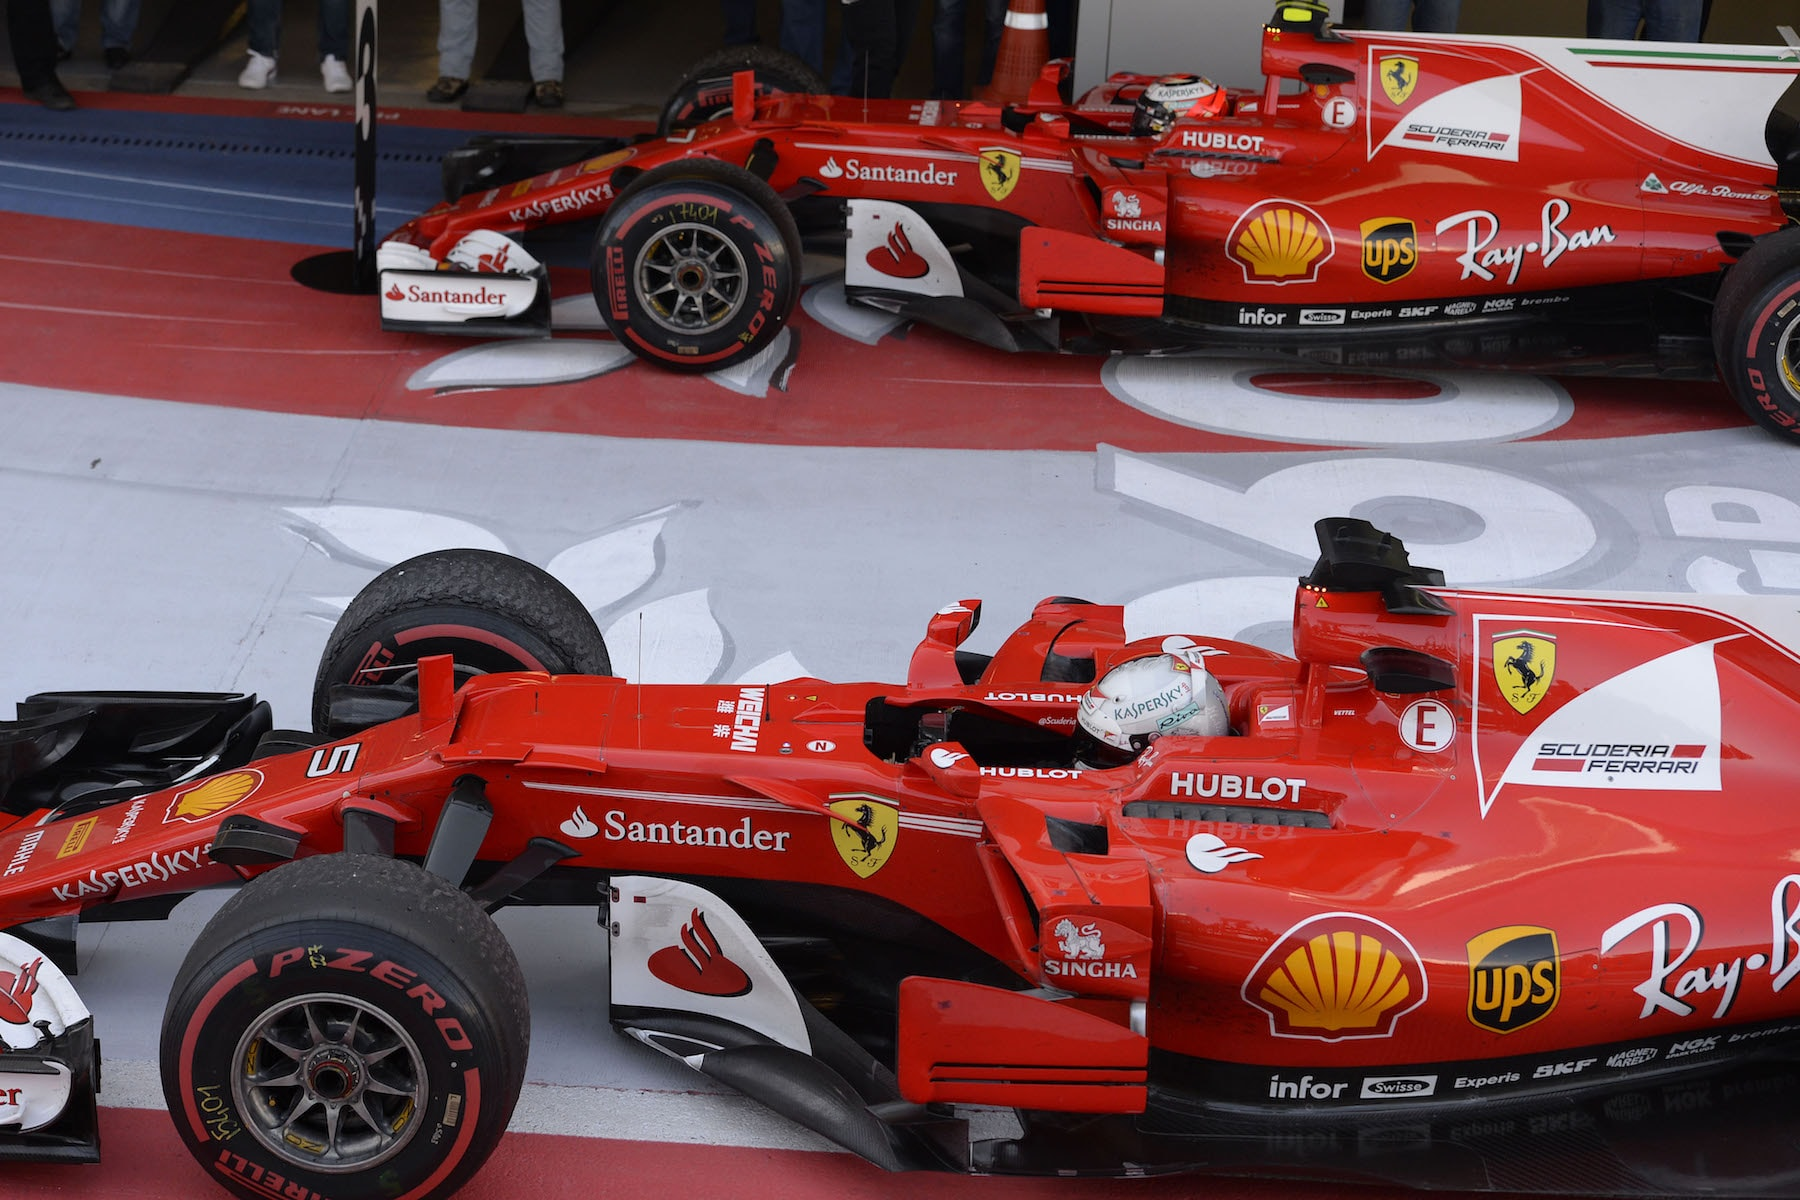 R 2017 Ferrari drivers arriving at Podium | 2017 Russian GP copy.jpg